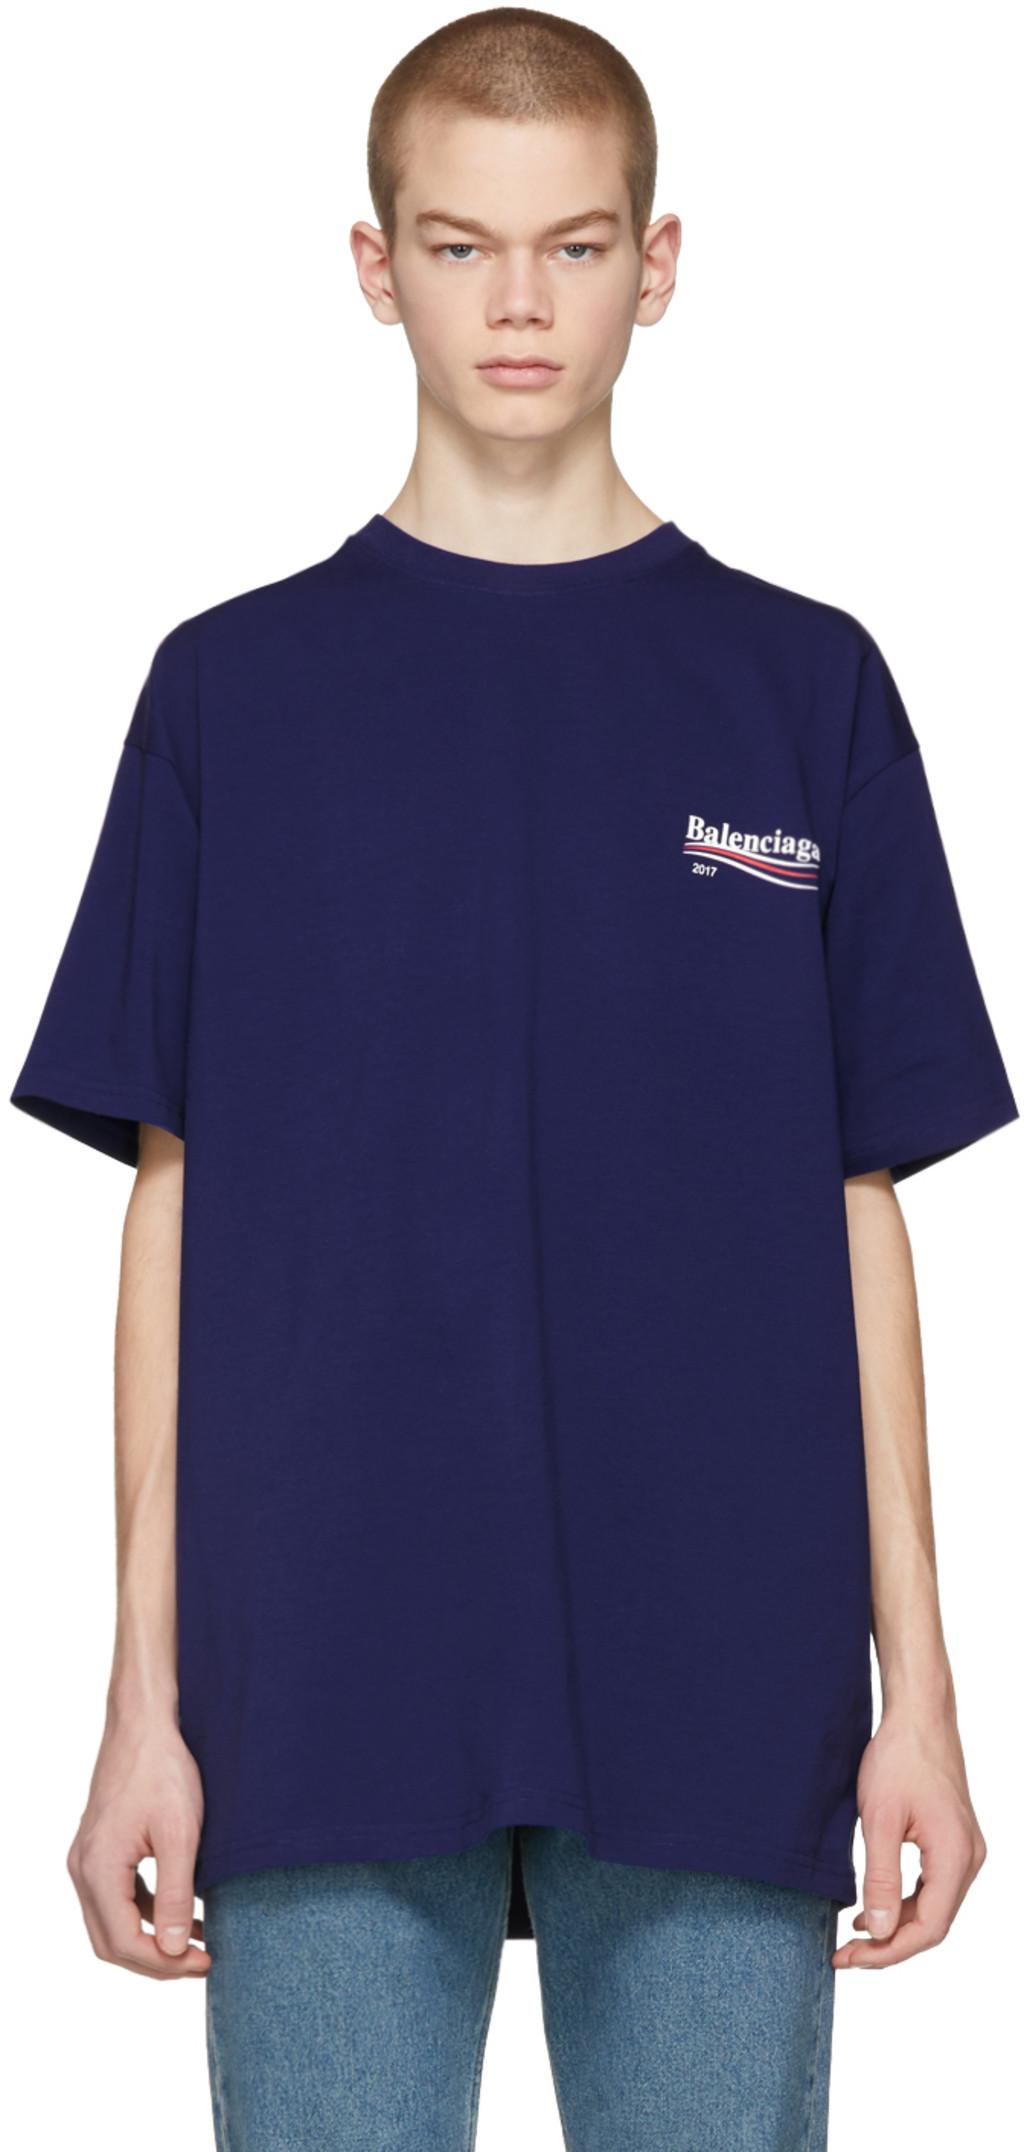 balenciaga t shirt mens 2017